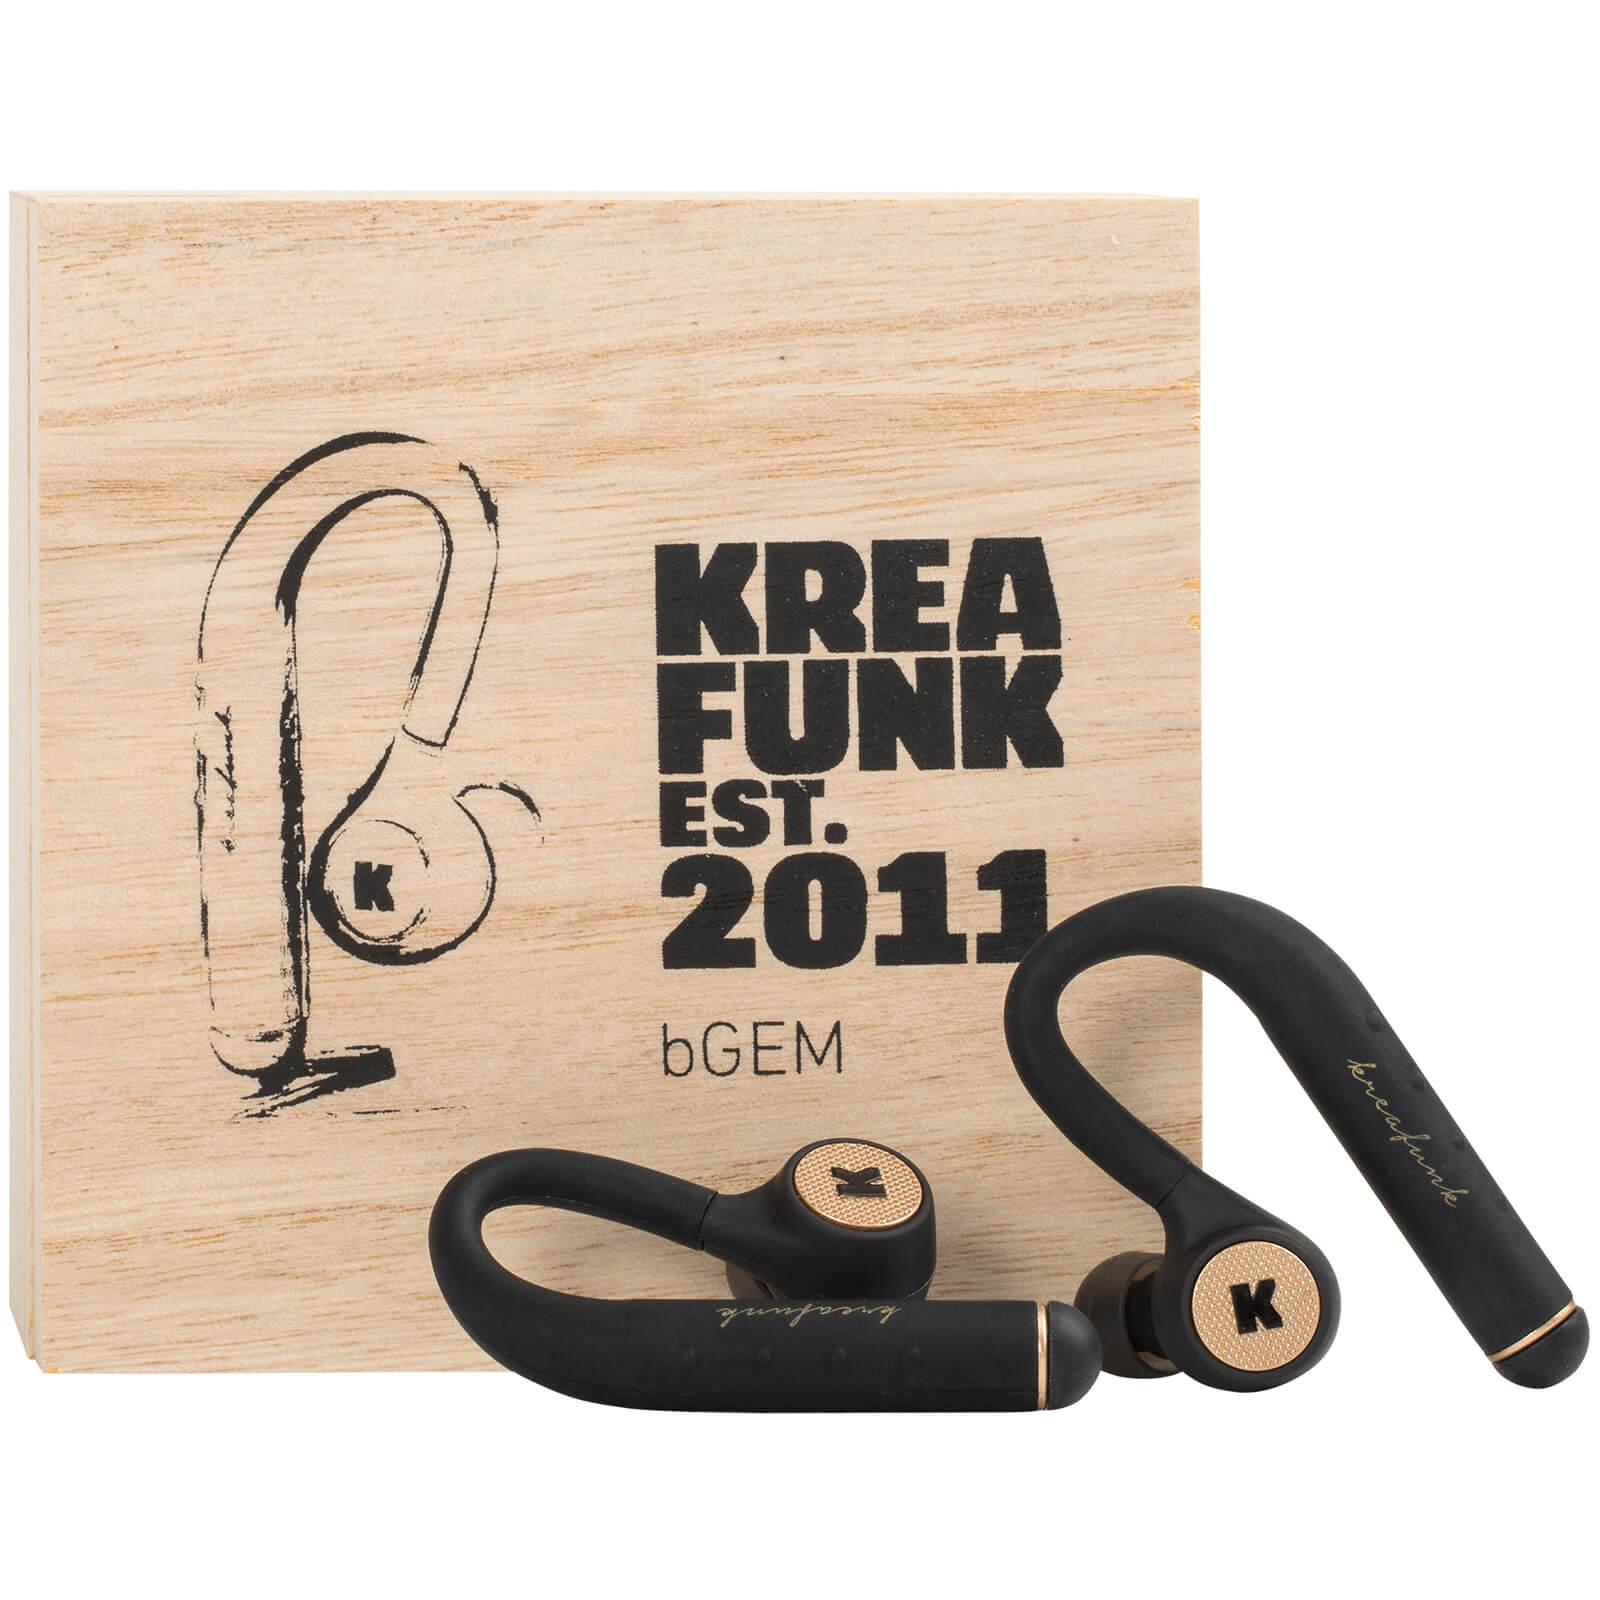 Kreafunk bGEM Bluetooth Wireless In-Ear Headphones - Black/Gold